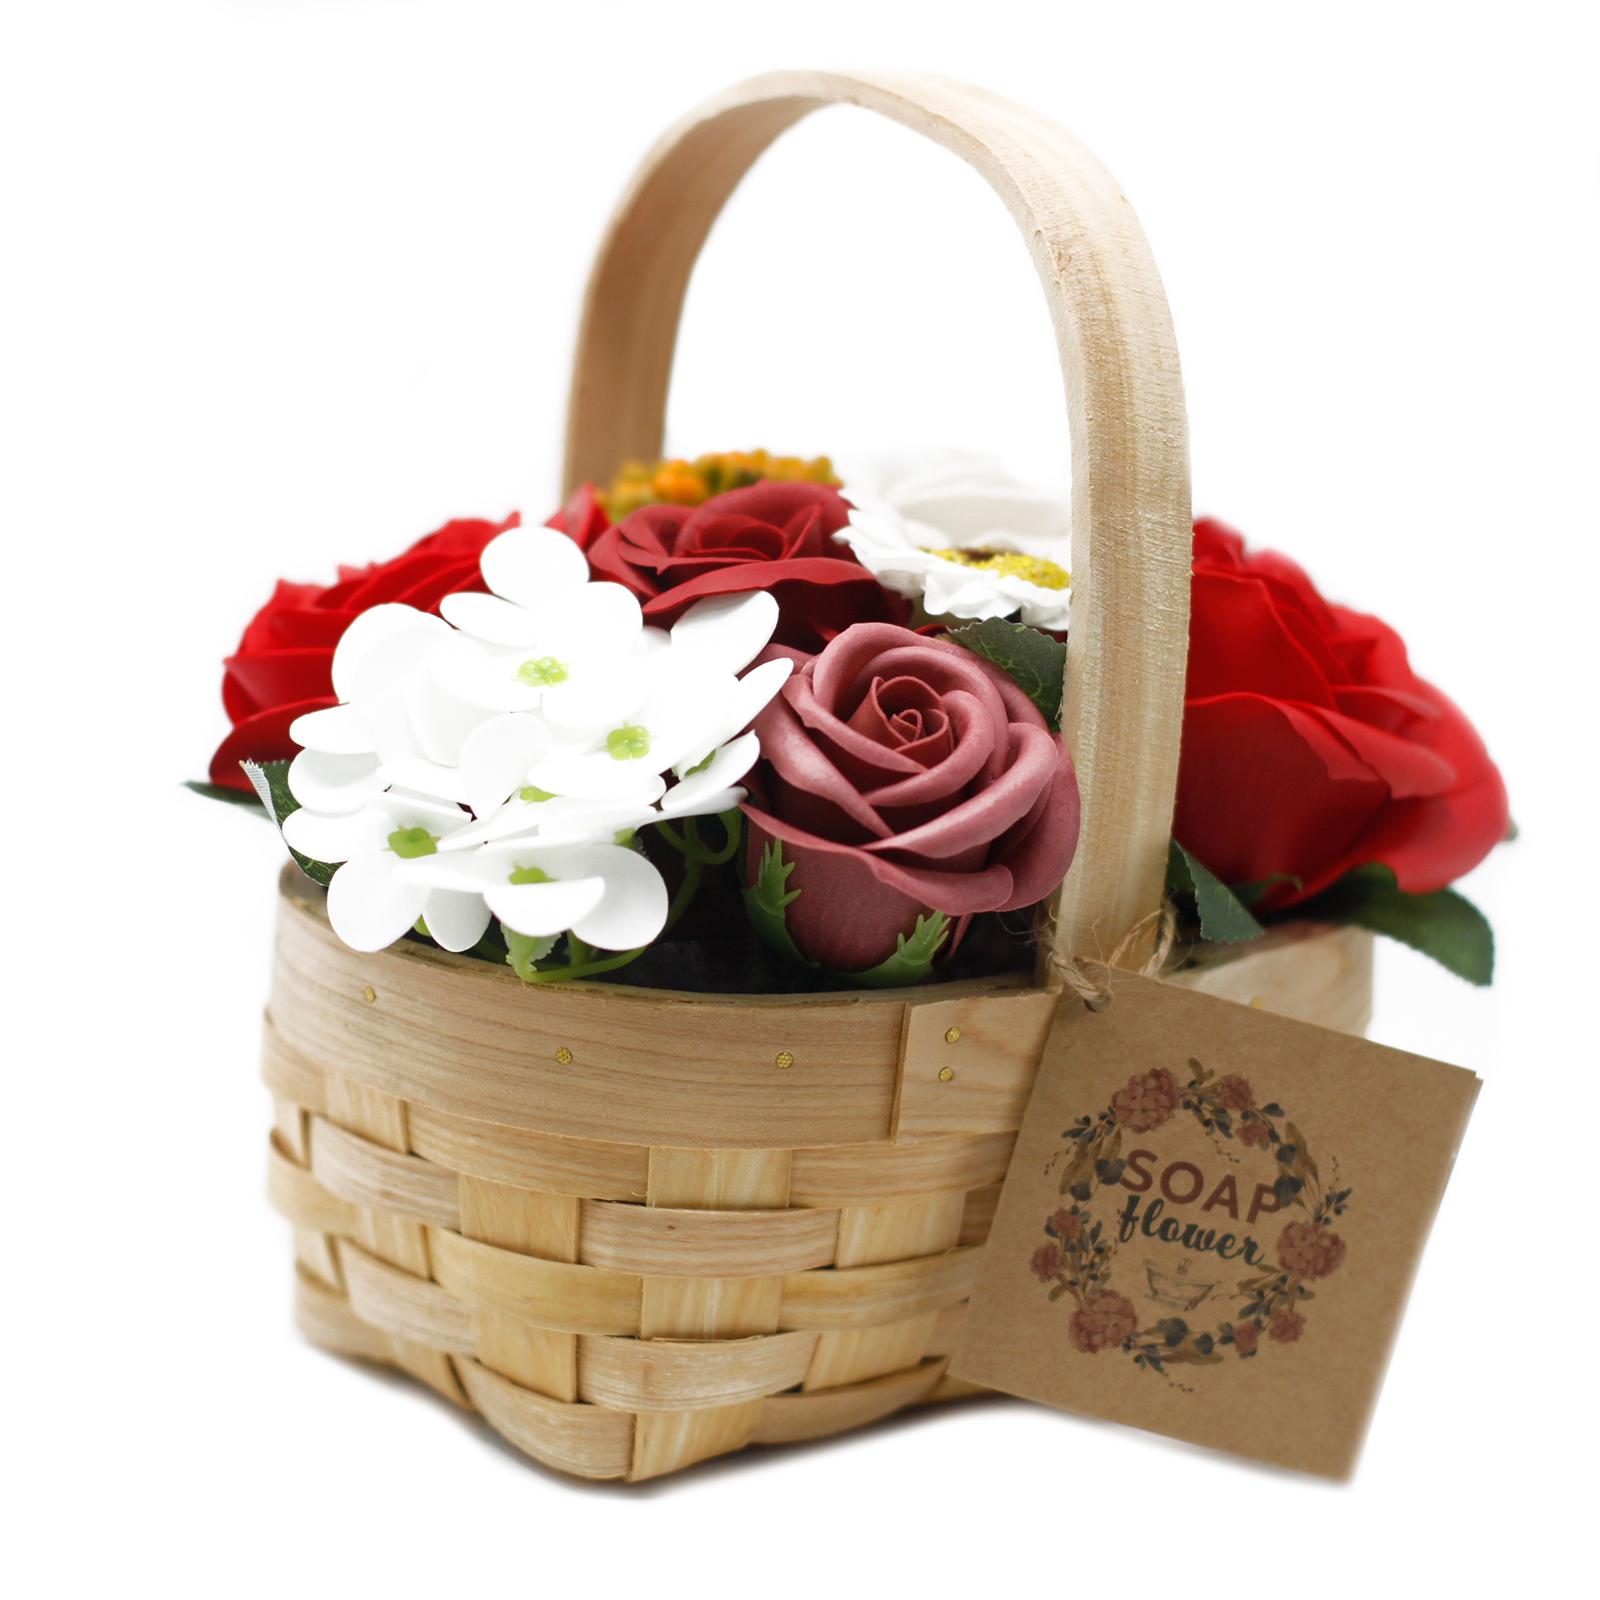 Medium Red Bouquet in Wicker Basket